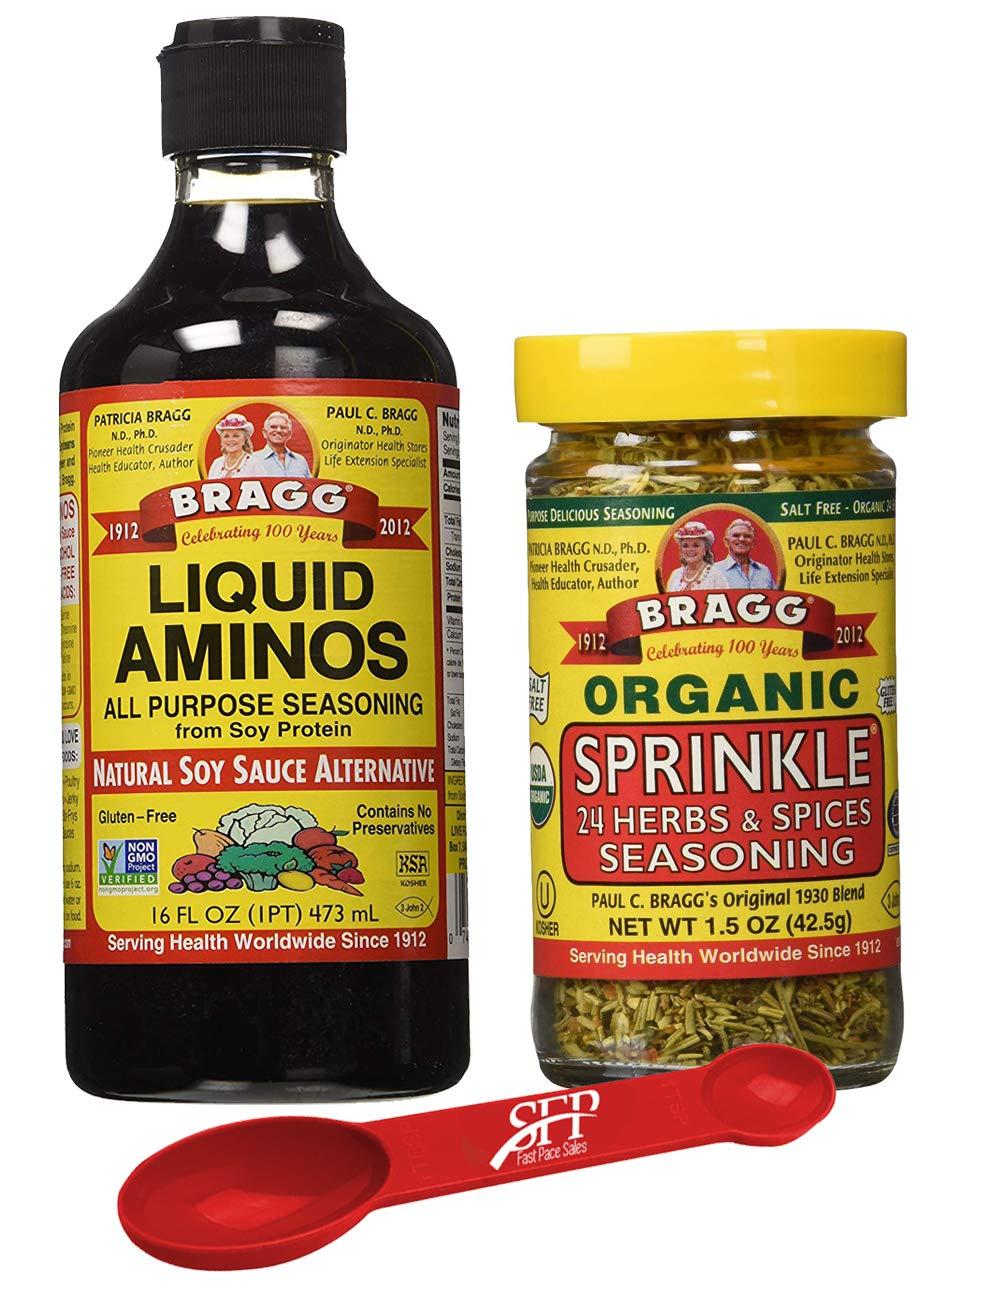 Bragg's Organic Variety Pack for Cooking: Bragg Organic Liquid Aminos 16 Oz + Bragg's Sprinkle Seasoning Blend - 24 Herb & Spices, 1.5 Oz